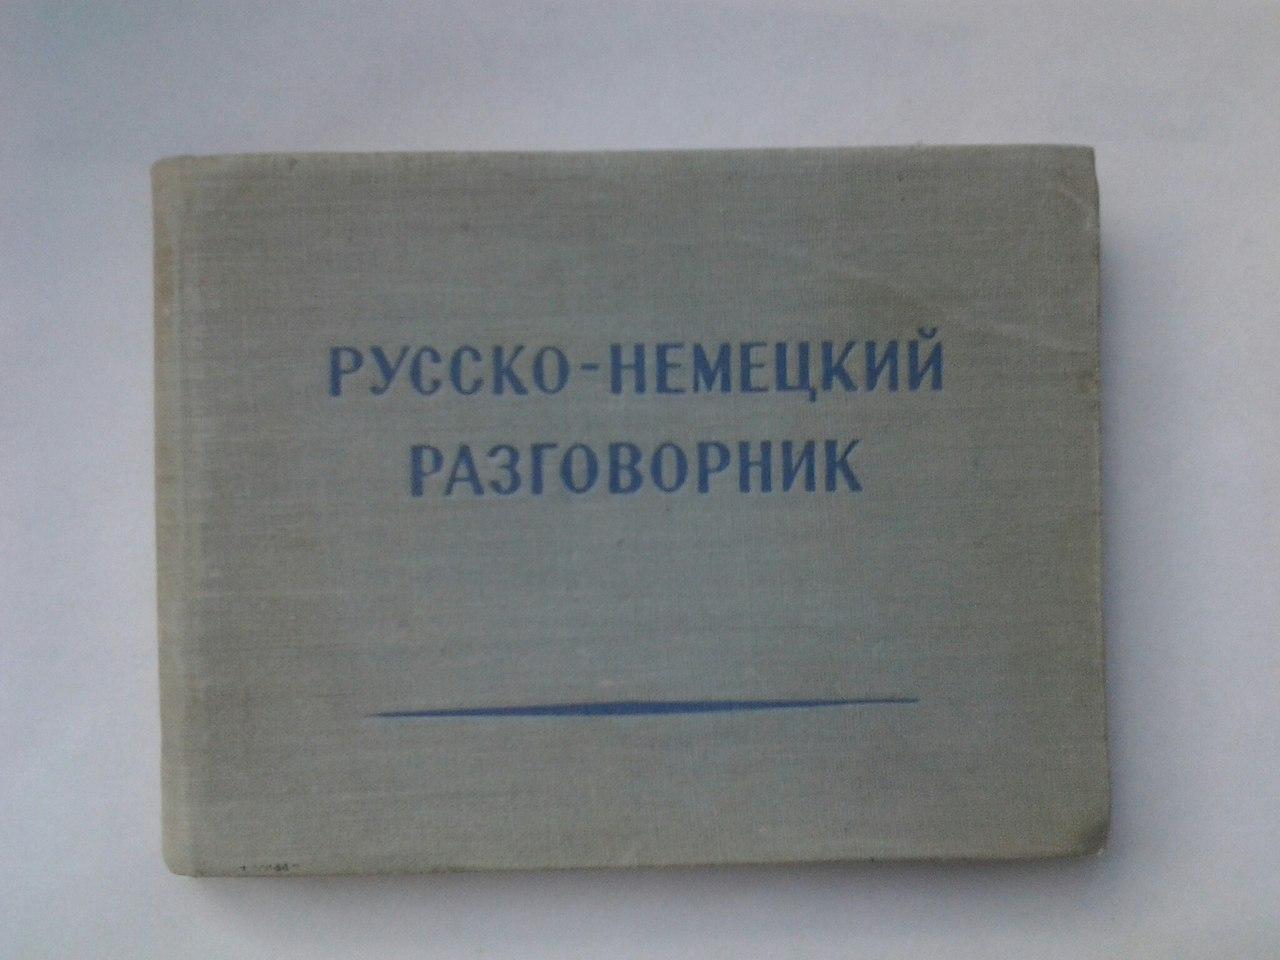 Предметы по вермахту и РККА. 59905975